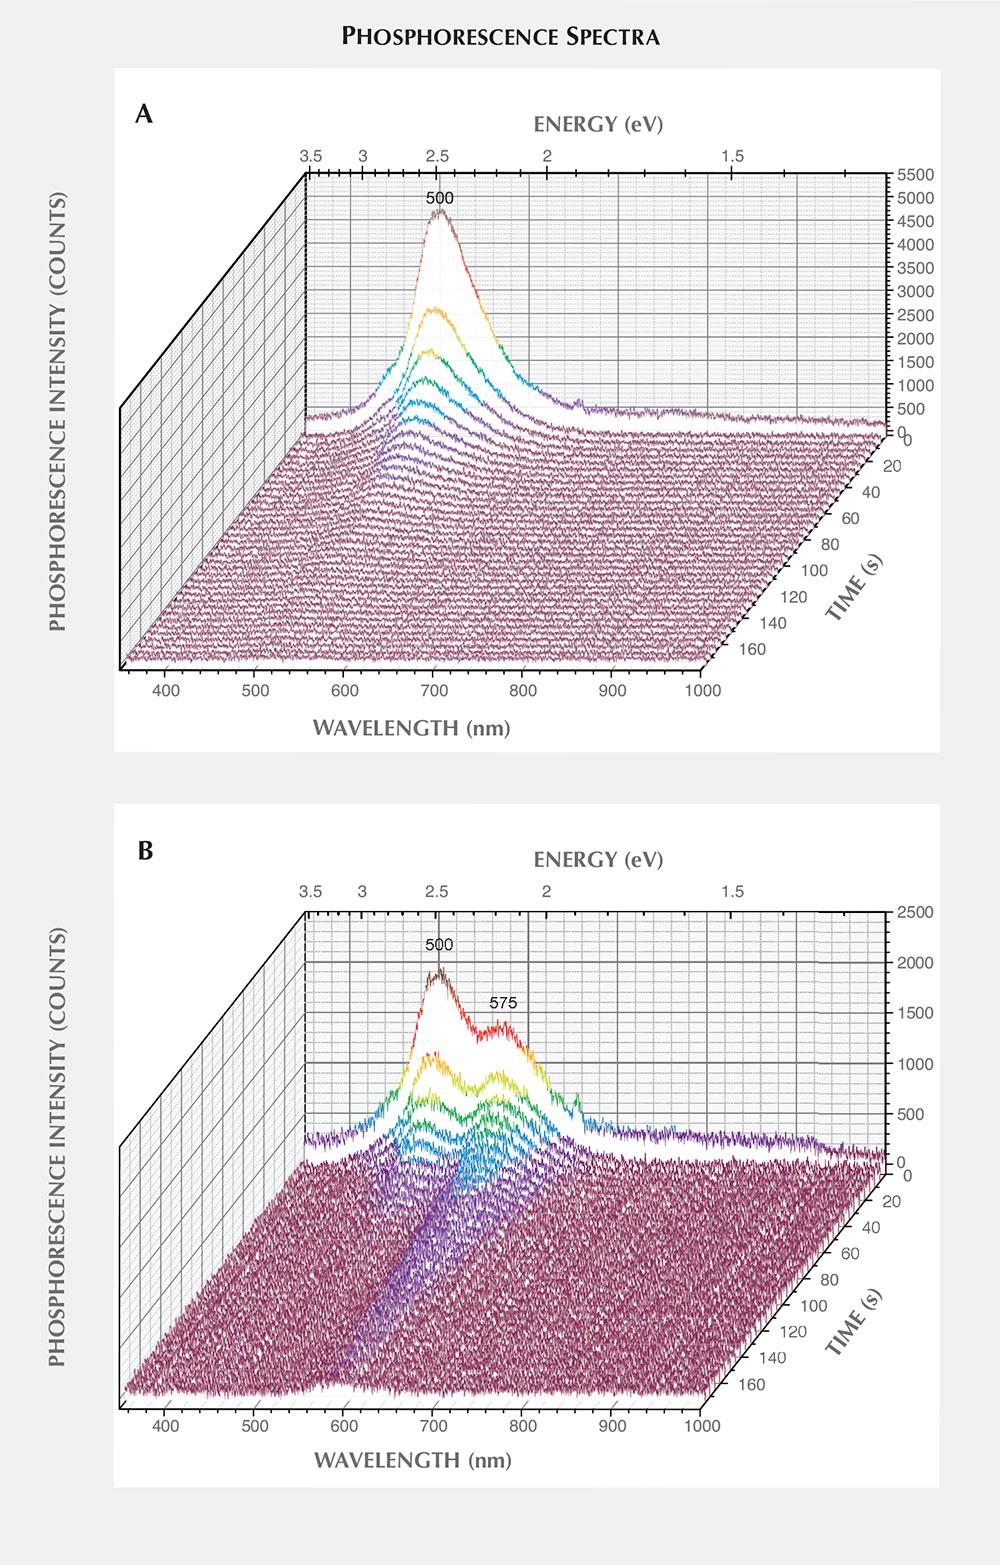 Phosphorescence spectra of HPHT synthetic diamond samples